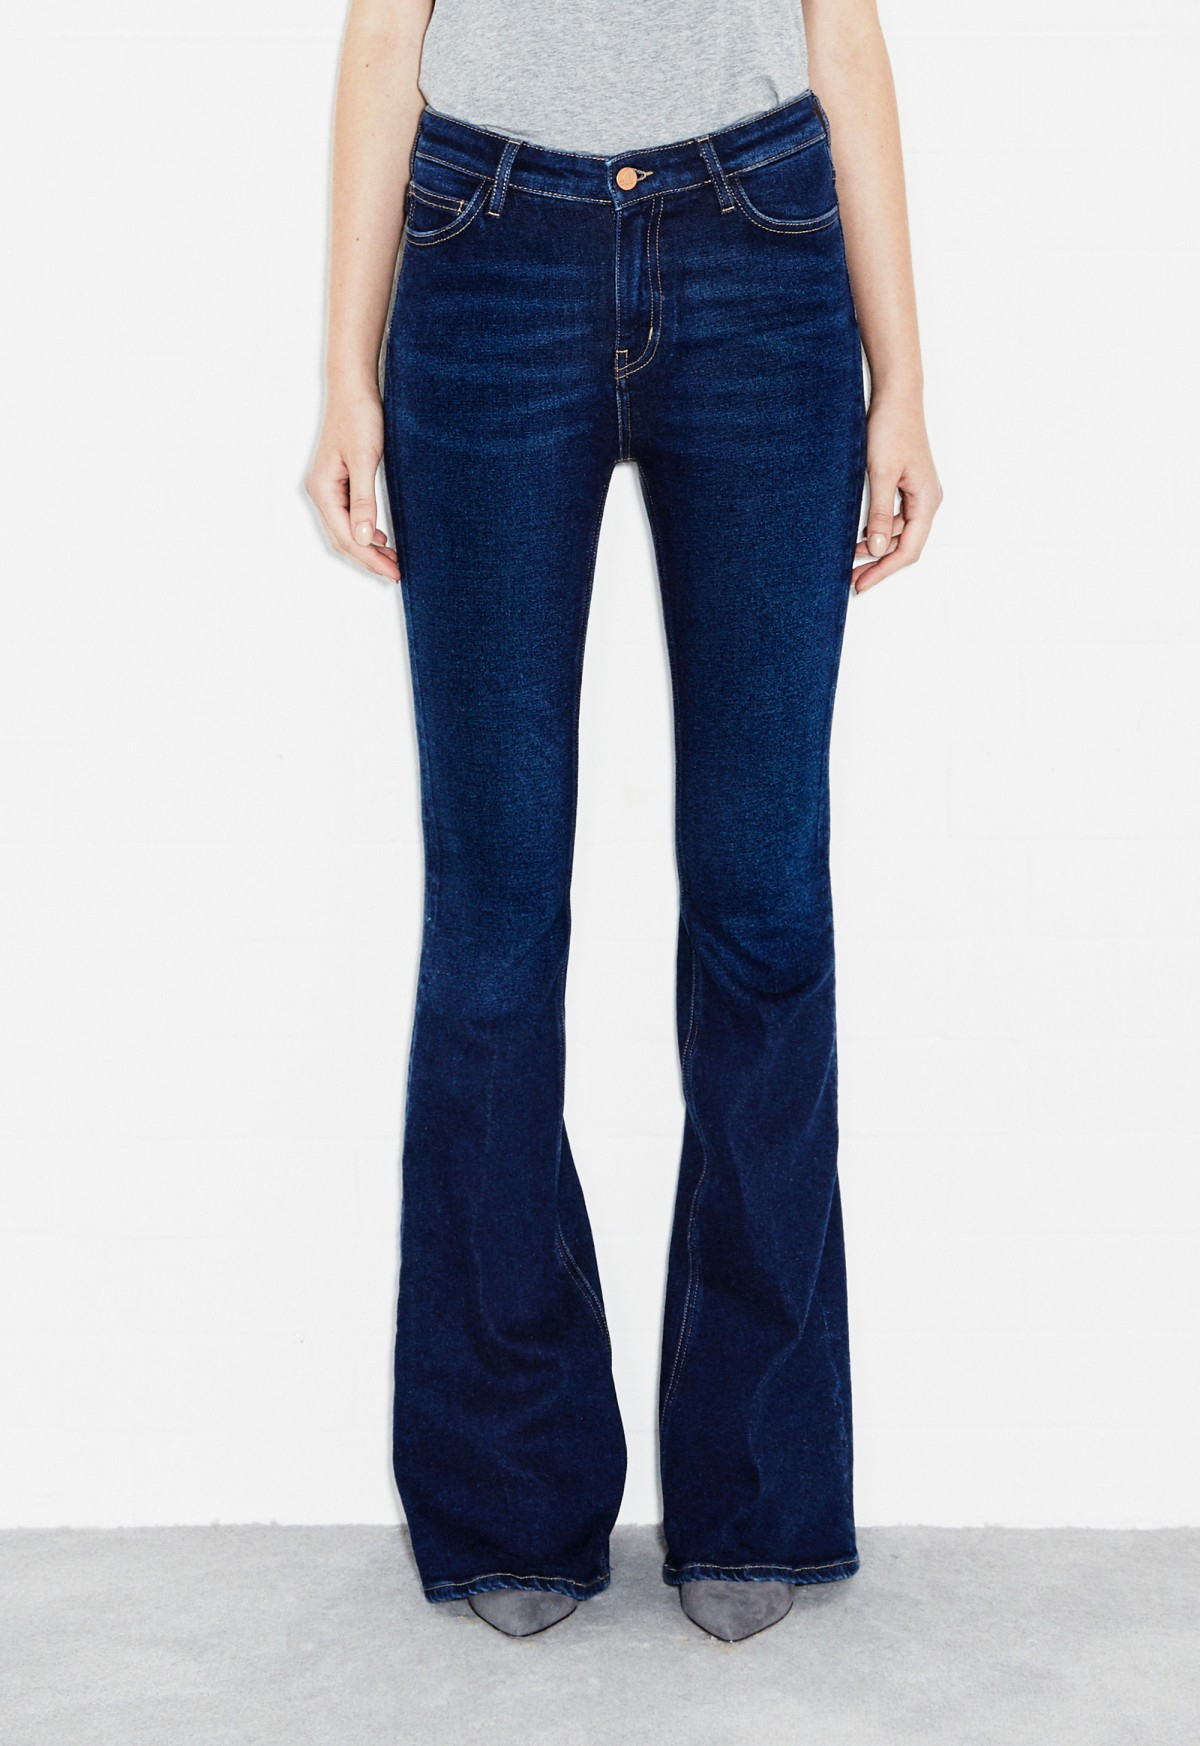 MiH Jeans The Stevie denim flare jeans